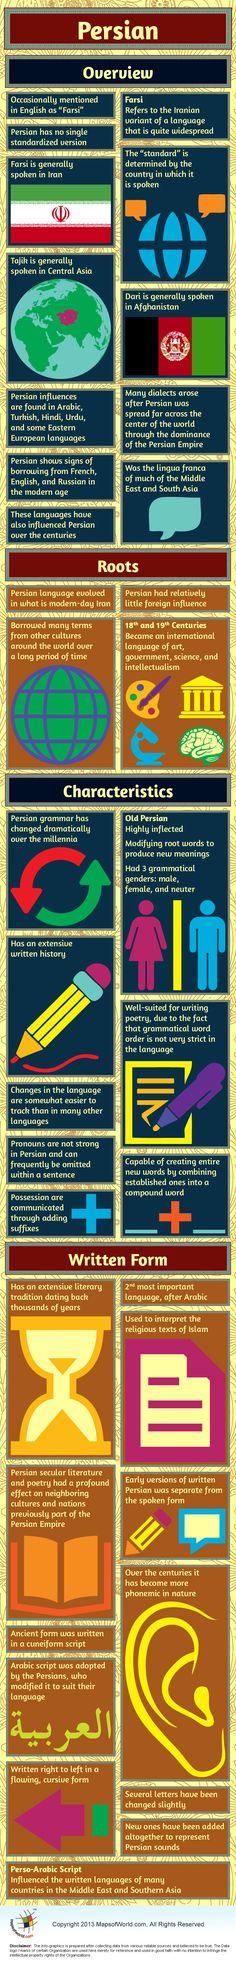 Infographic of Persian Language.